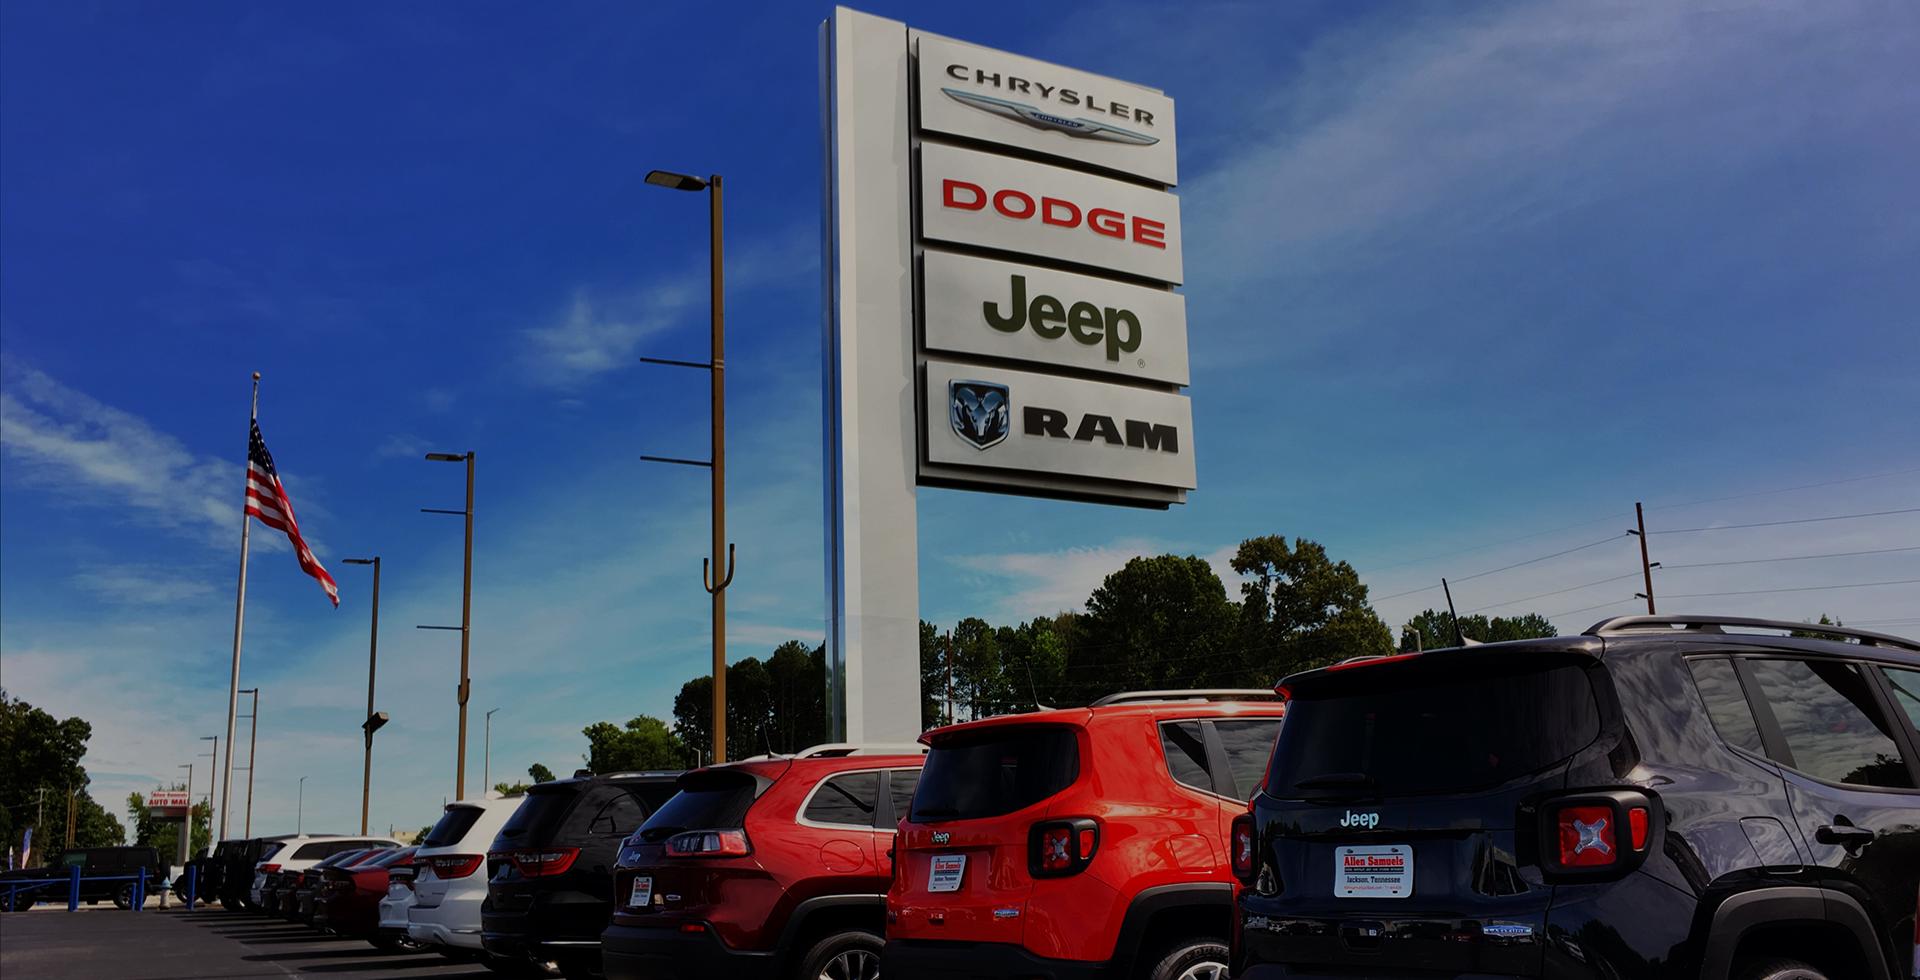 dodge dealership jackson tn Allen Samuels Chrysler Dodge Jeep Ram (Jackson)  CDJR Dealer in